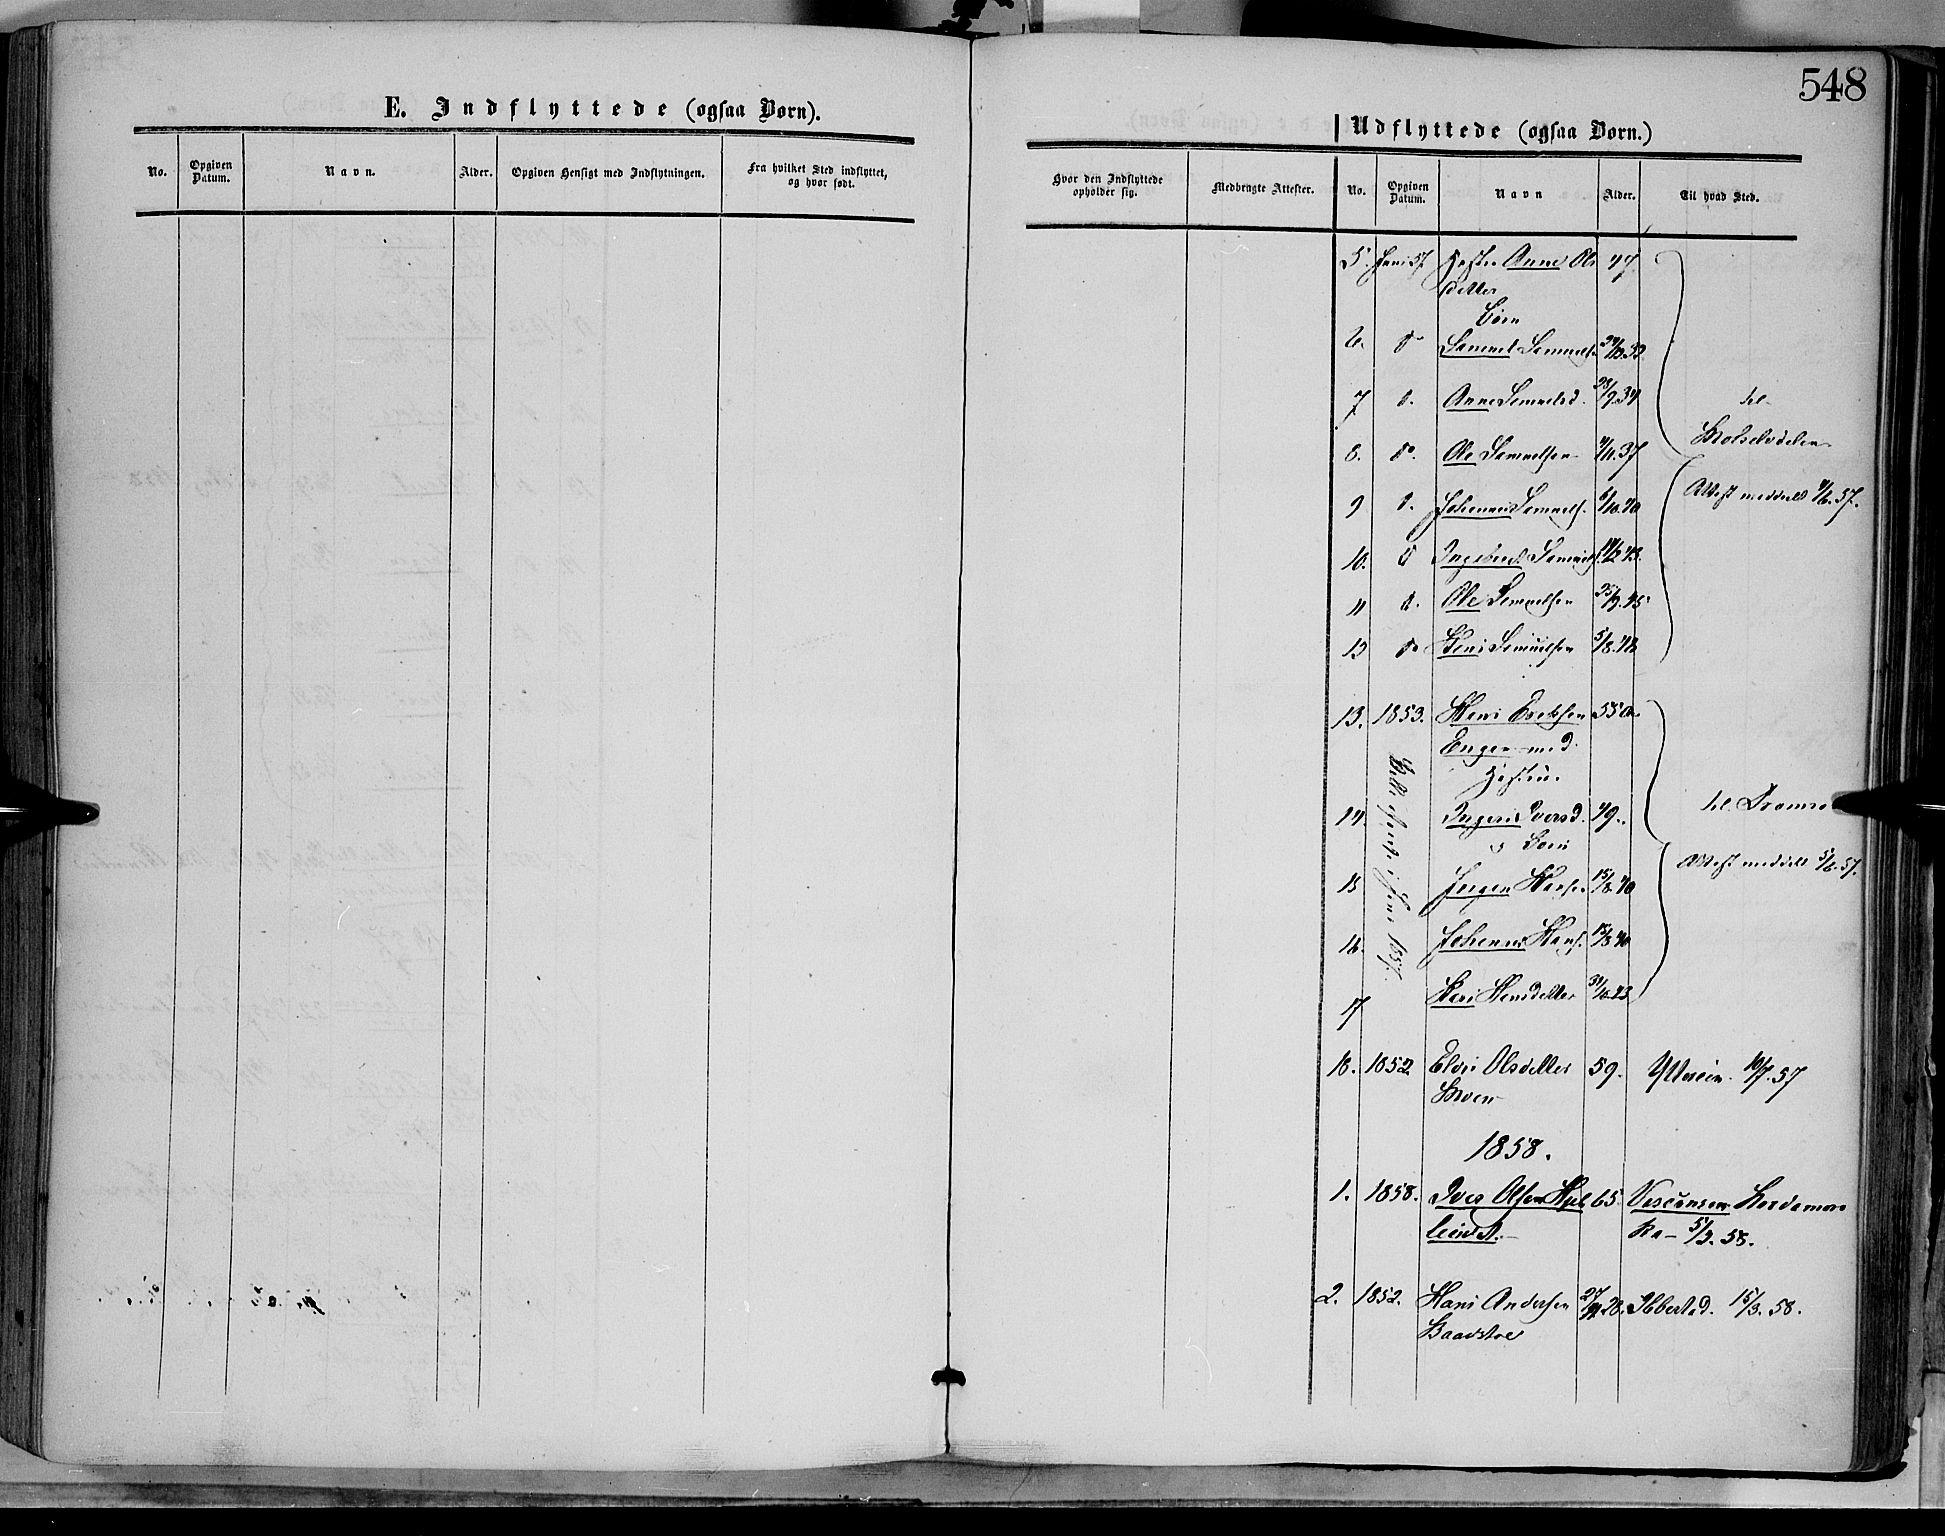 SAH, Dovre prestekontor, Ministerialbok nr. 1, 1854-1878, s. 548